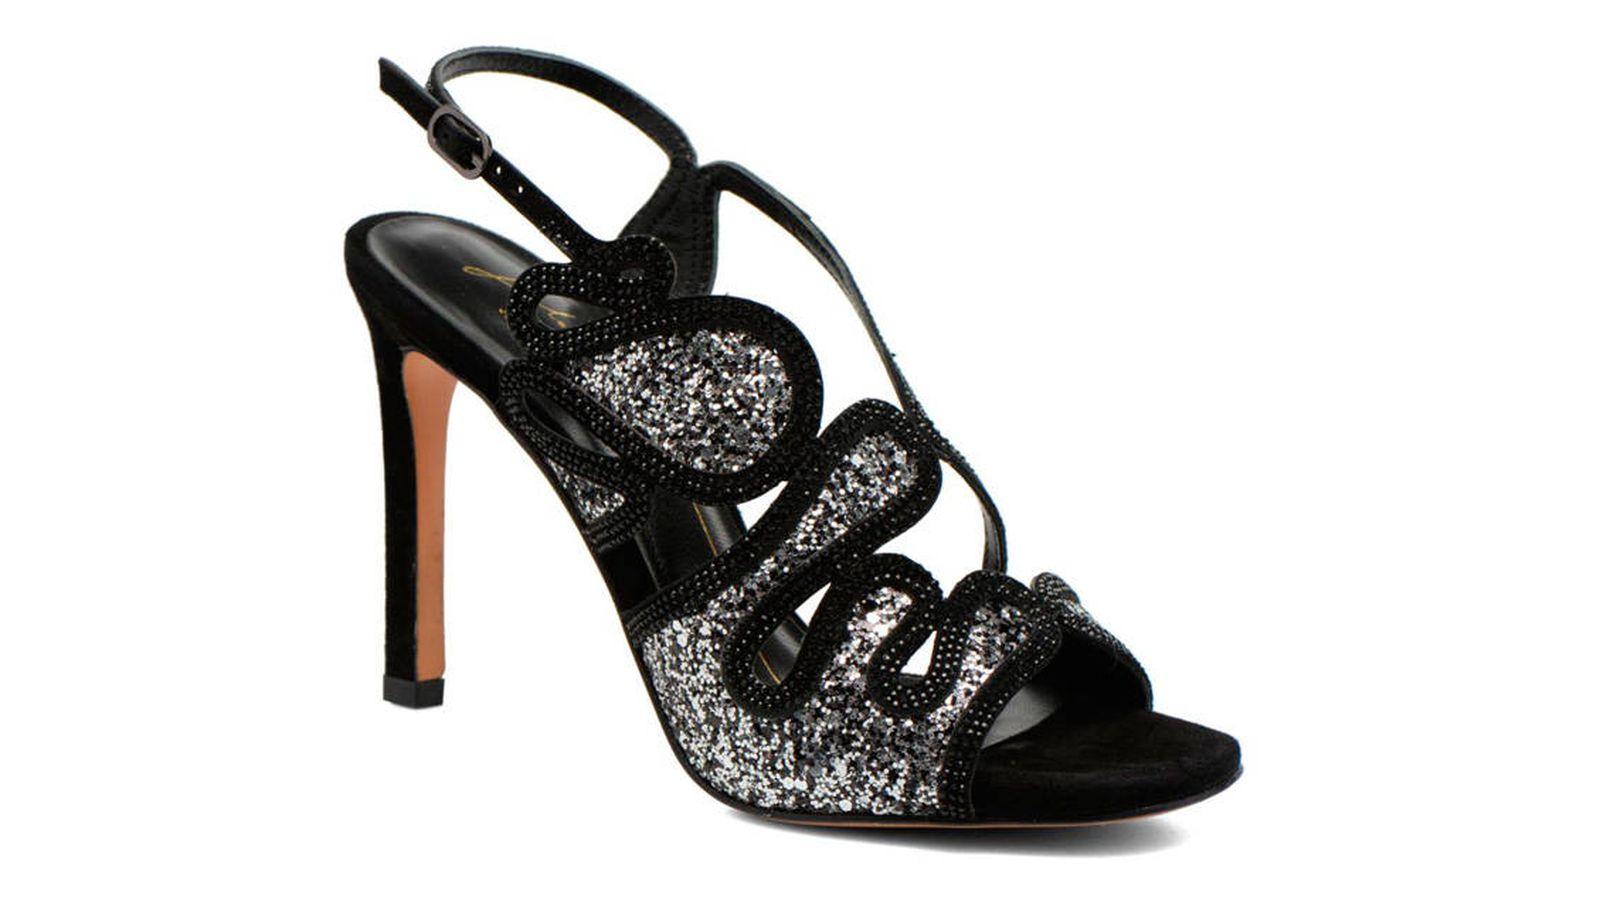 Solucionan Zapatos De Una Te Famosos¿invitada A Bodas BodaEstos Tl1JFKc